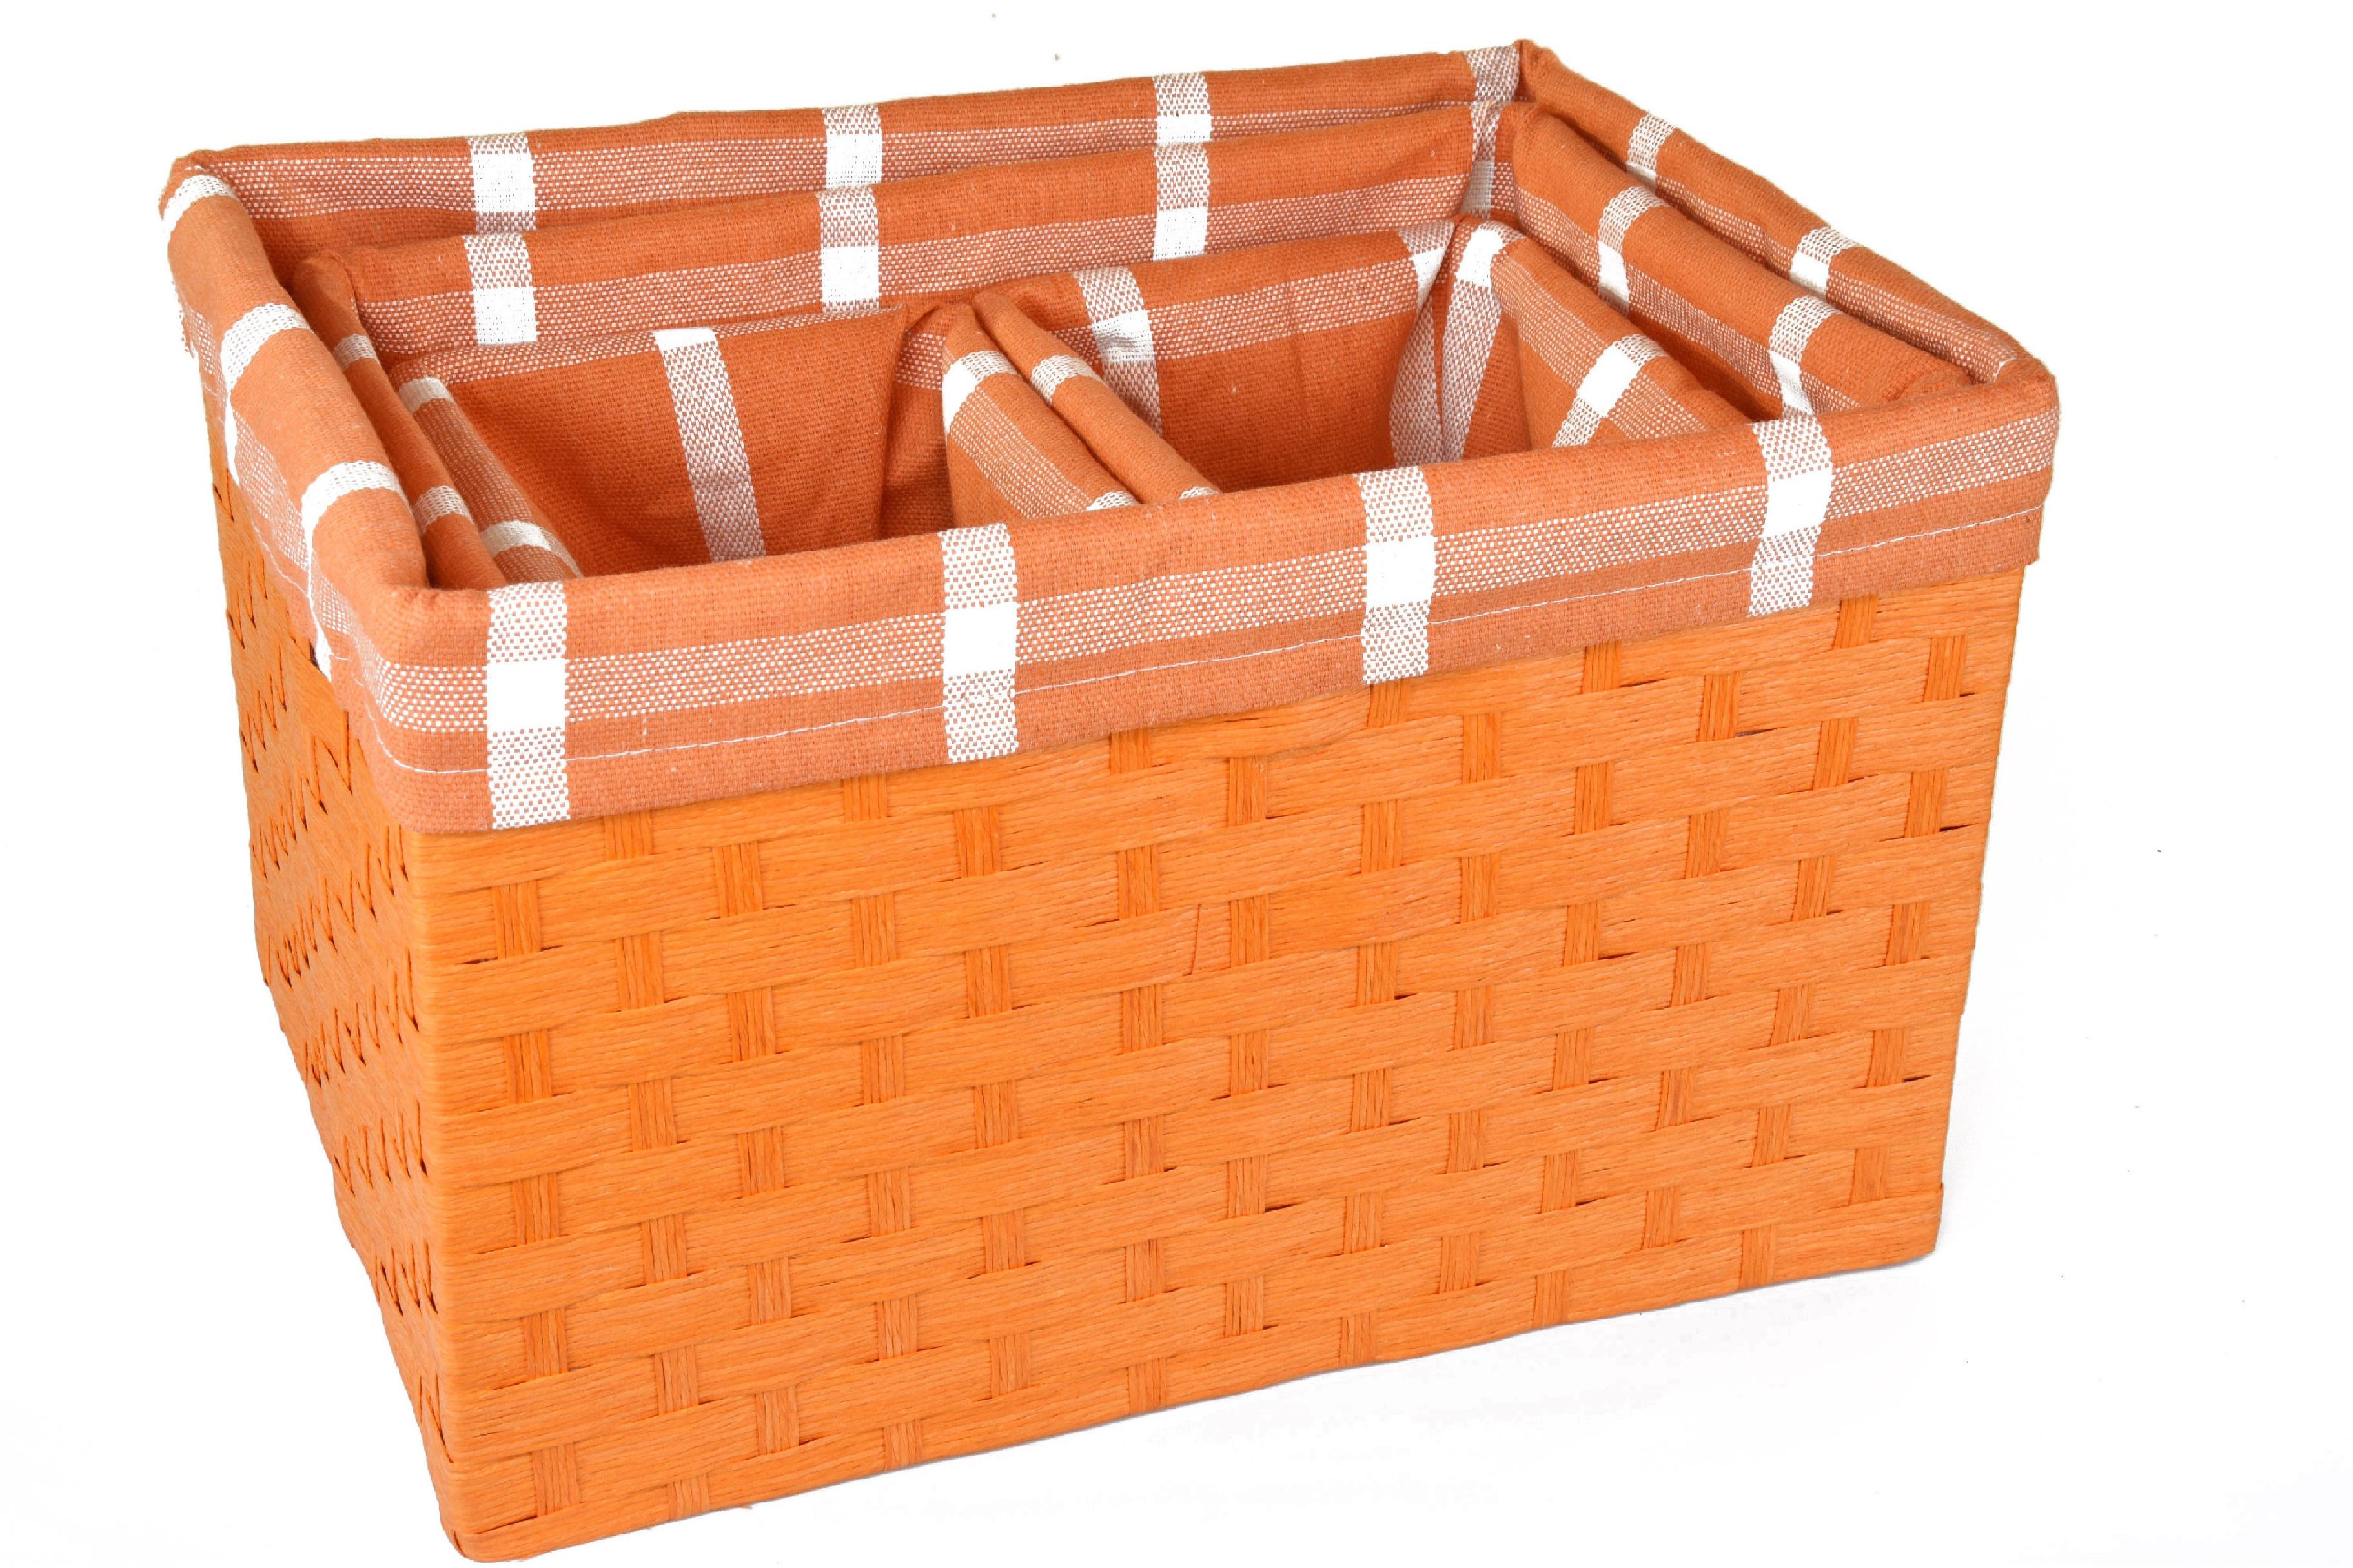 Úložný box oranžový rozměry boxu (cm): Sada 40x30x25,5|35x26x23,5|22x16x22,5|22x16x22,5